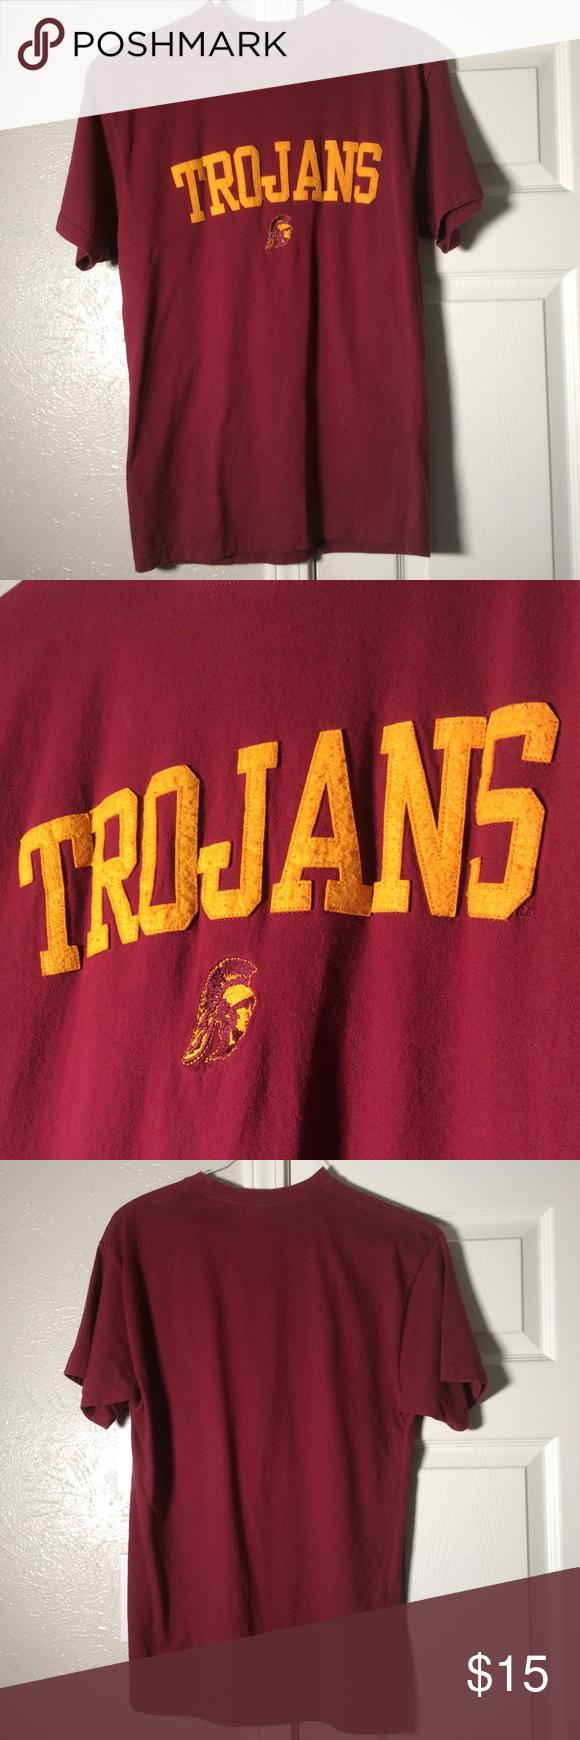 Usc Trojans Stitched Lettering Shirt Usc Trojans Letter Shirts Usc